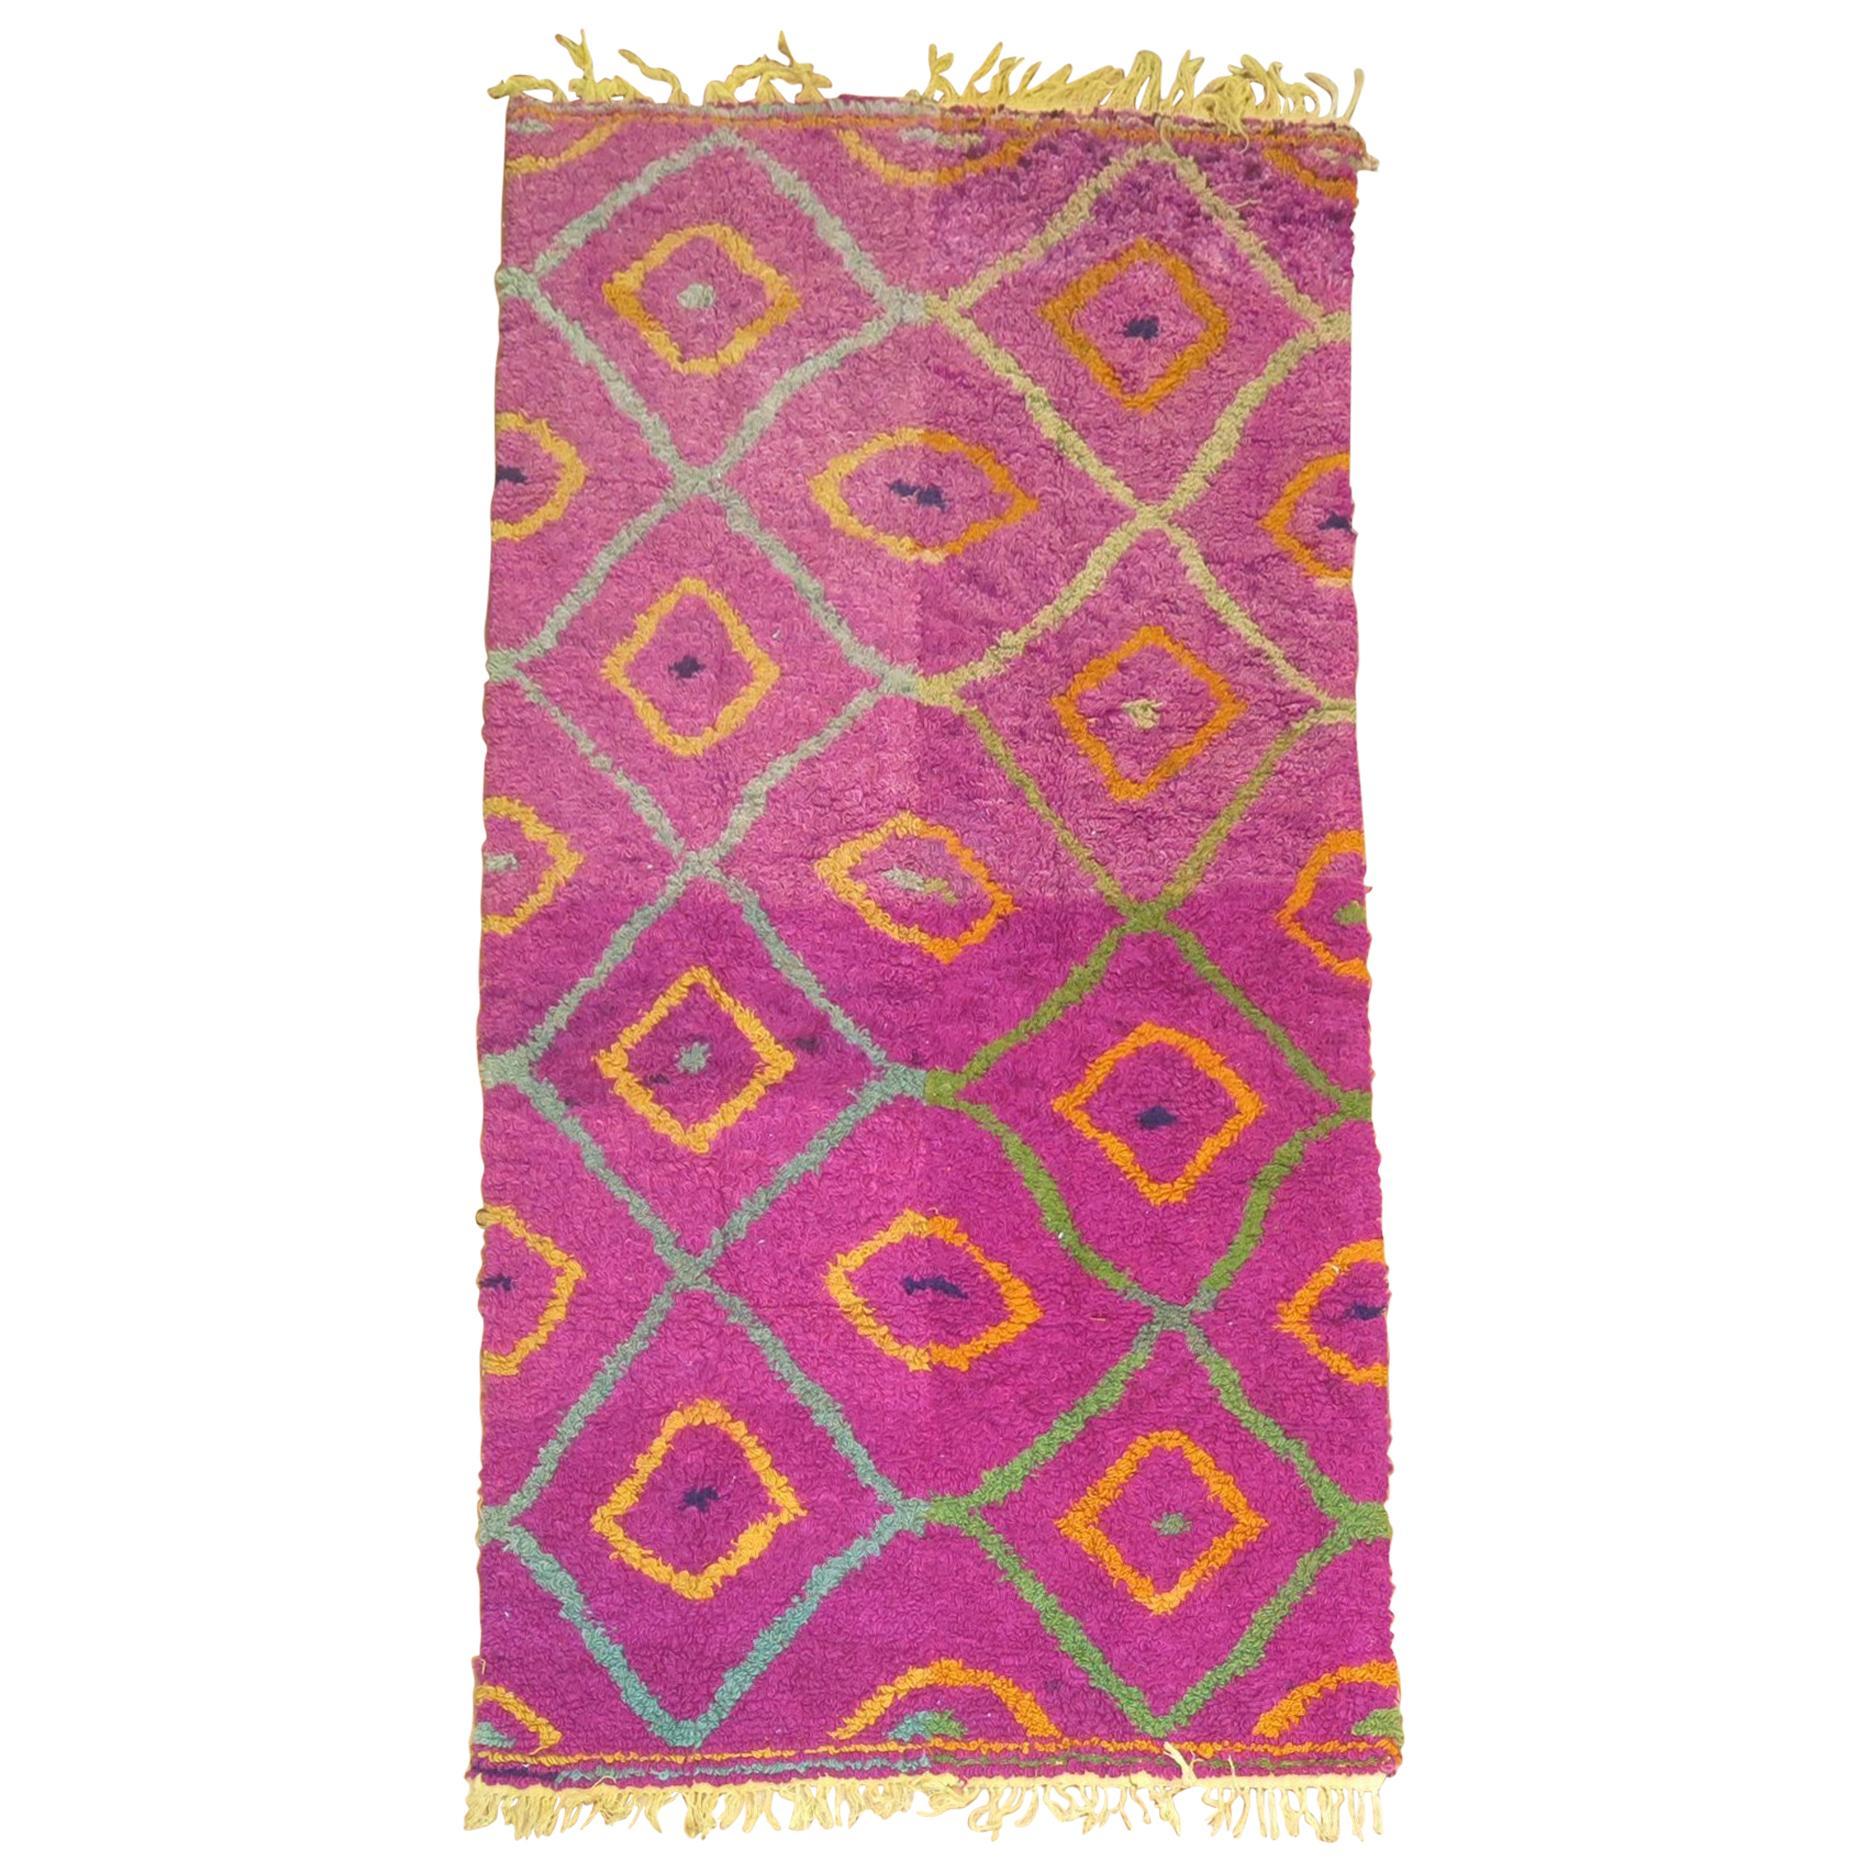 Vintage Moroccan Inspired Rug